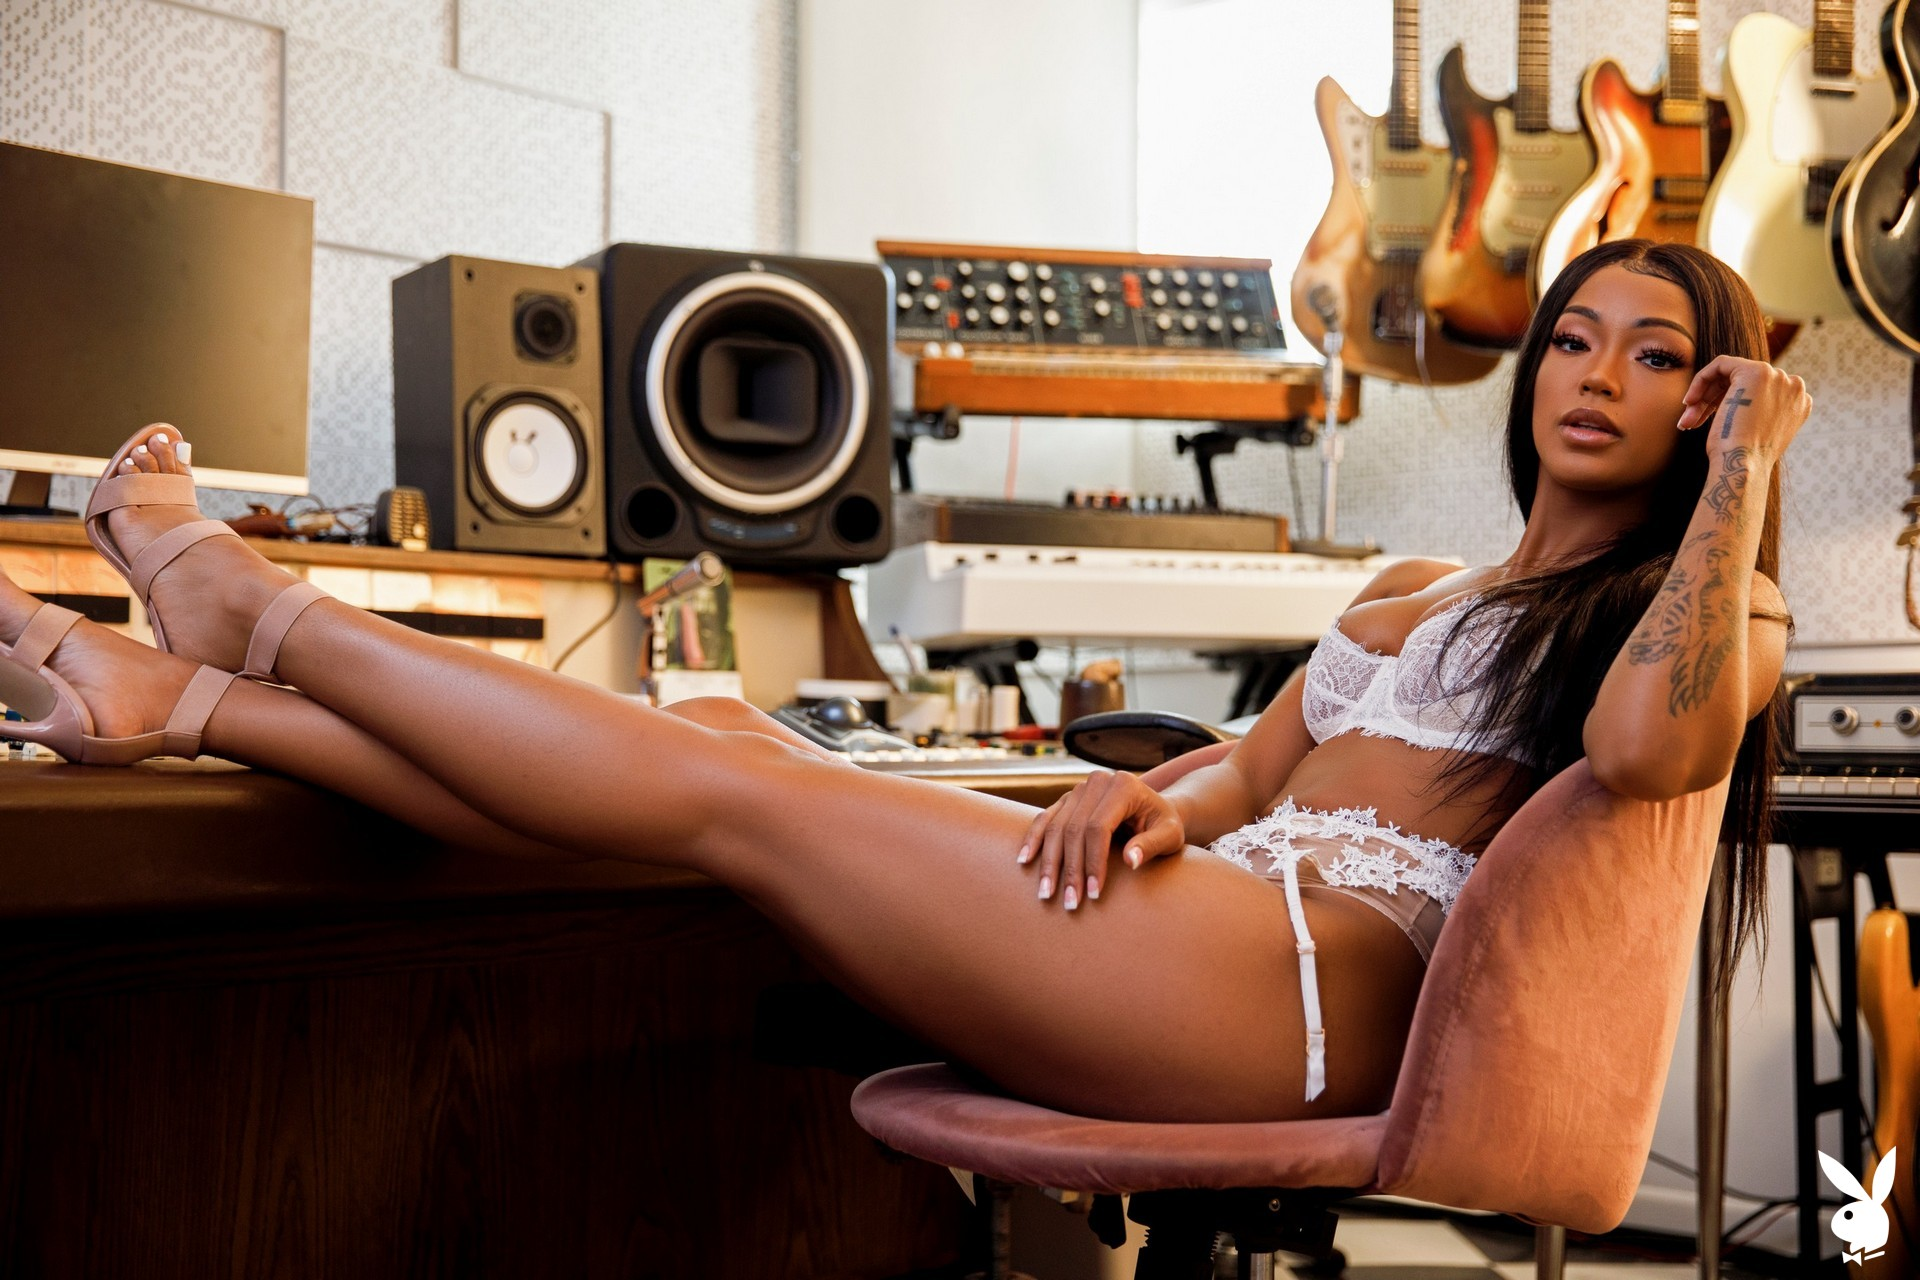 Harley Dean In Studio Session Playboy Plus (10)